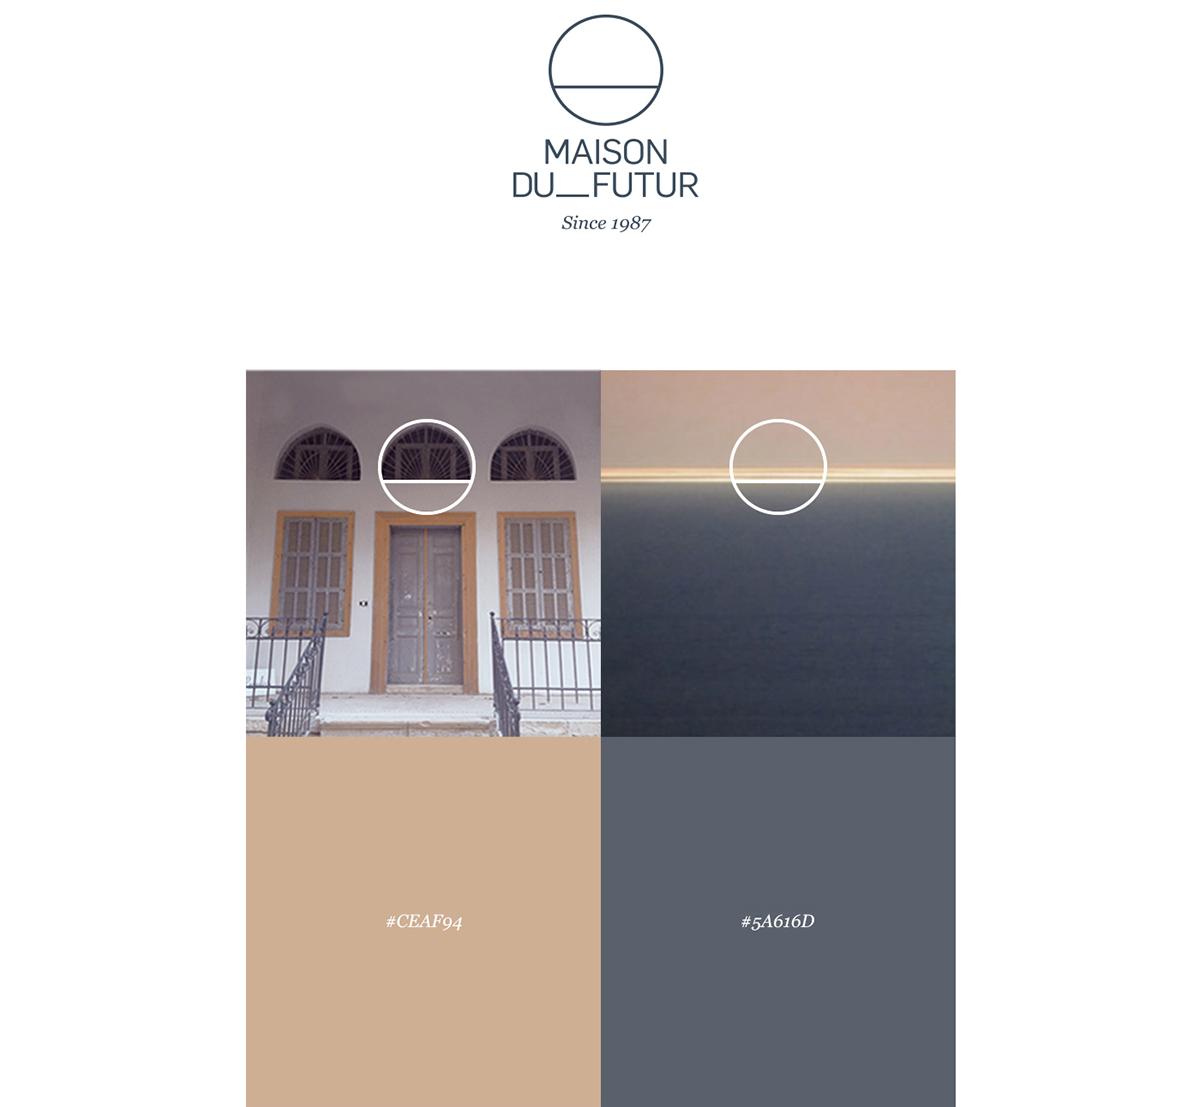 maison du futur branding on behance. Black Bedroom Furniture Sets. Home Design Ideas